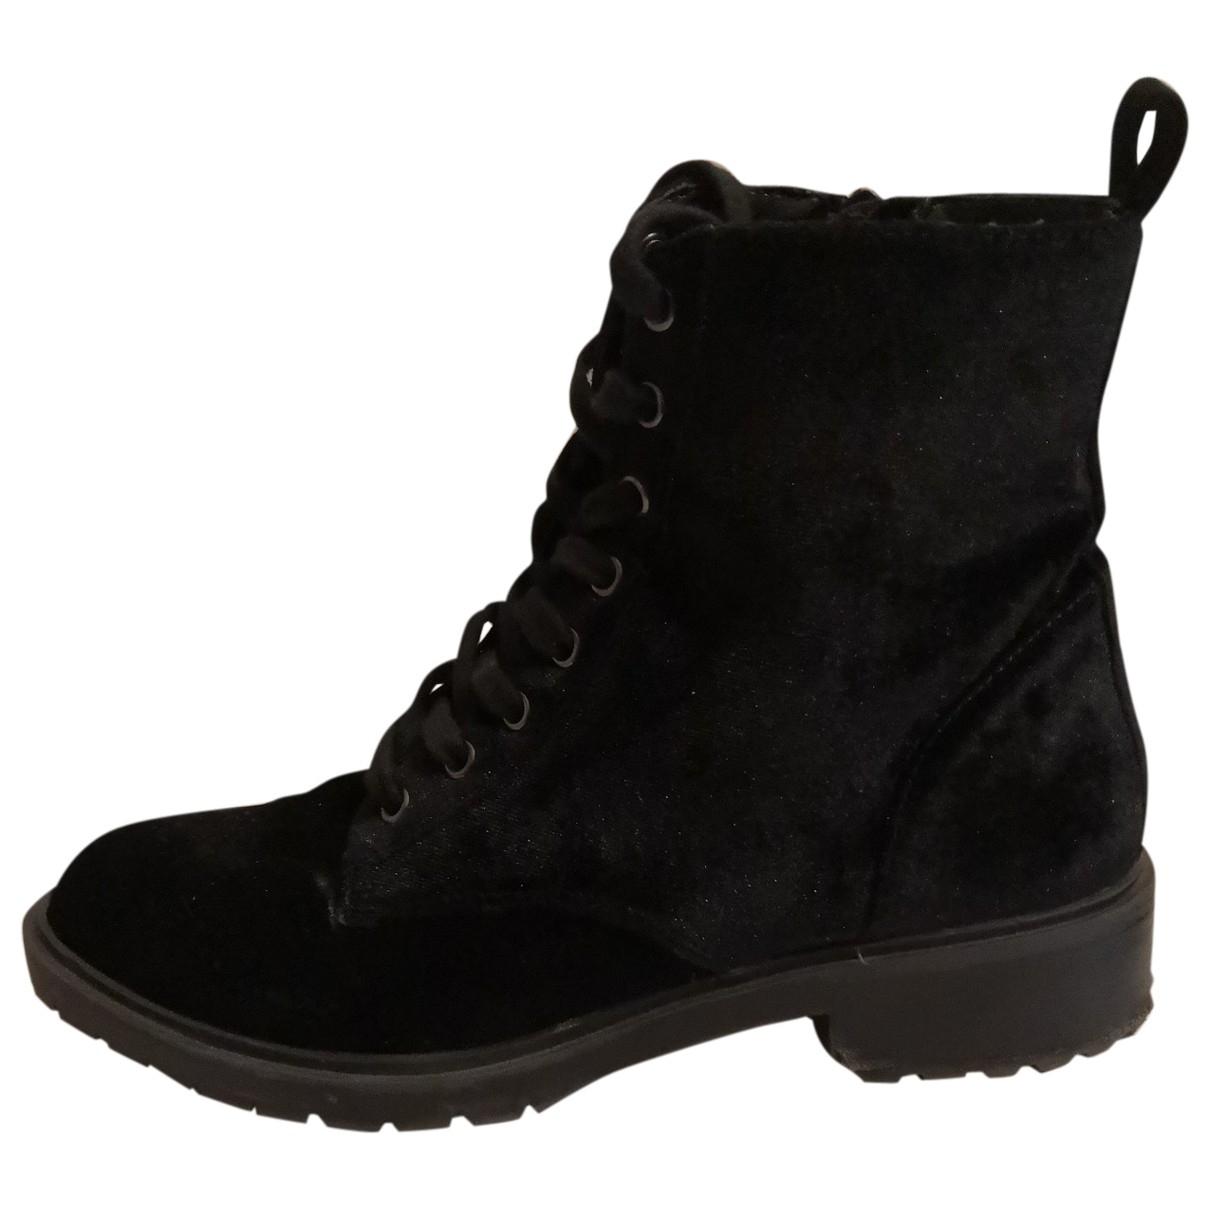 Steve Madden - Boots   pour femme en velours - noir